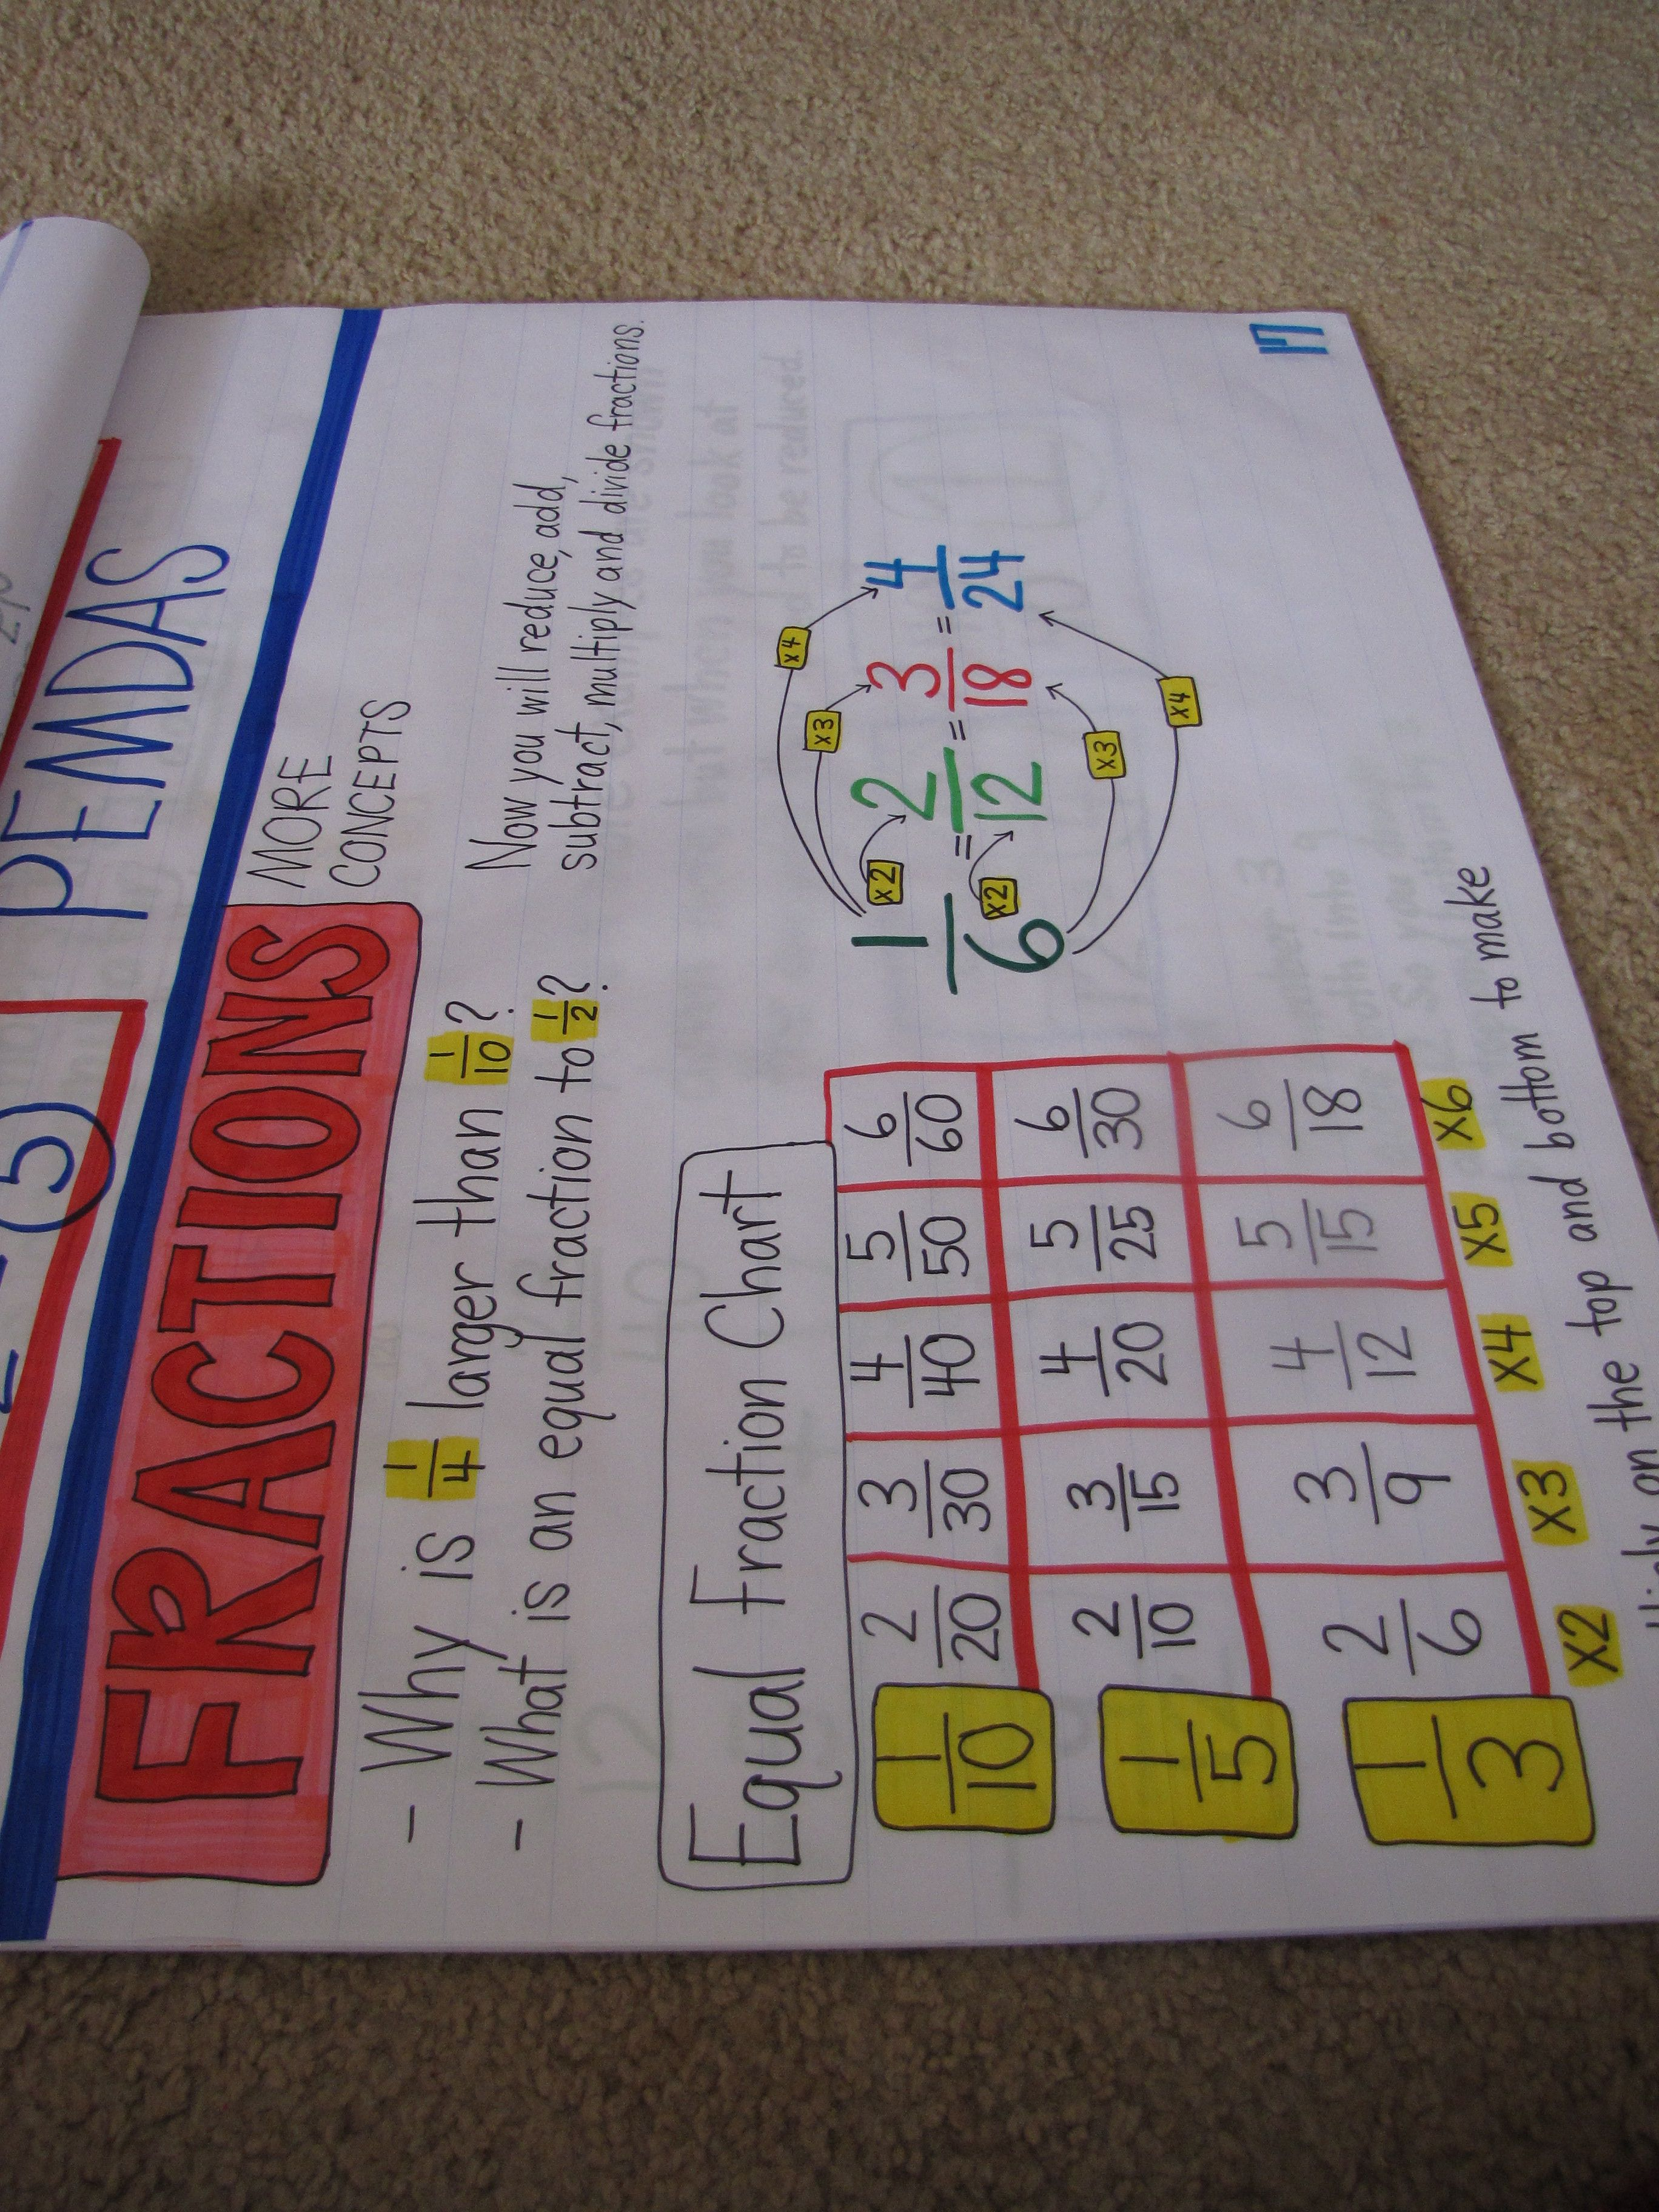 Identifying Equivalent Fractions T Fracciones